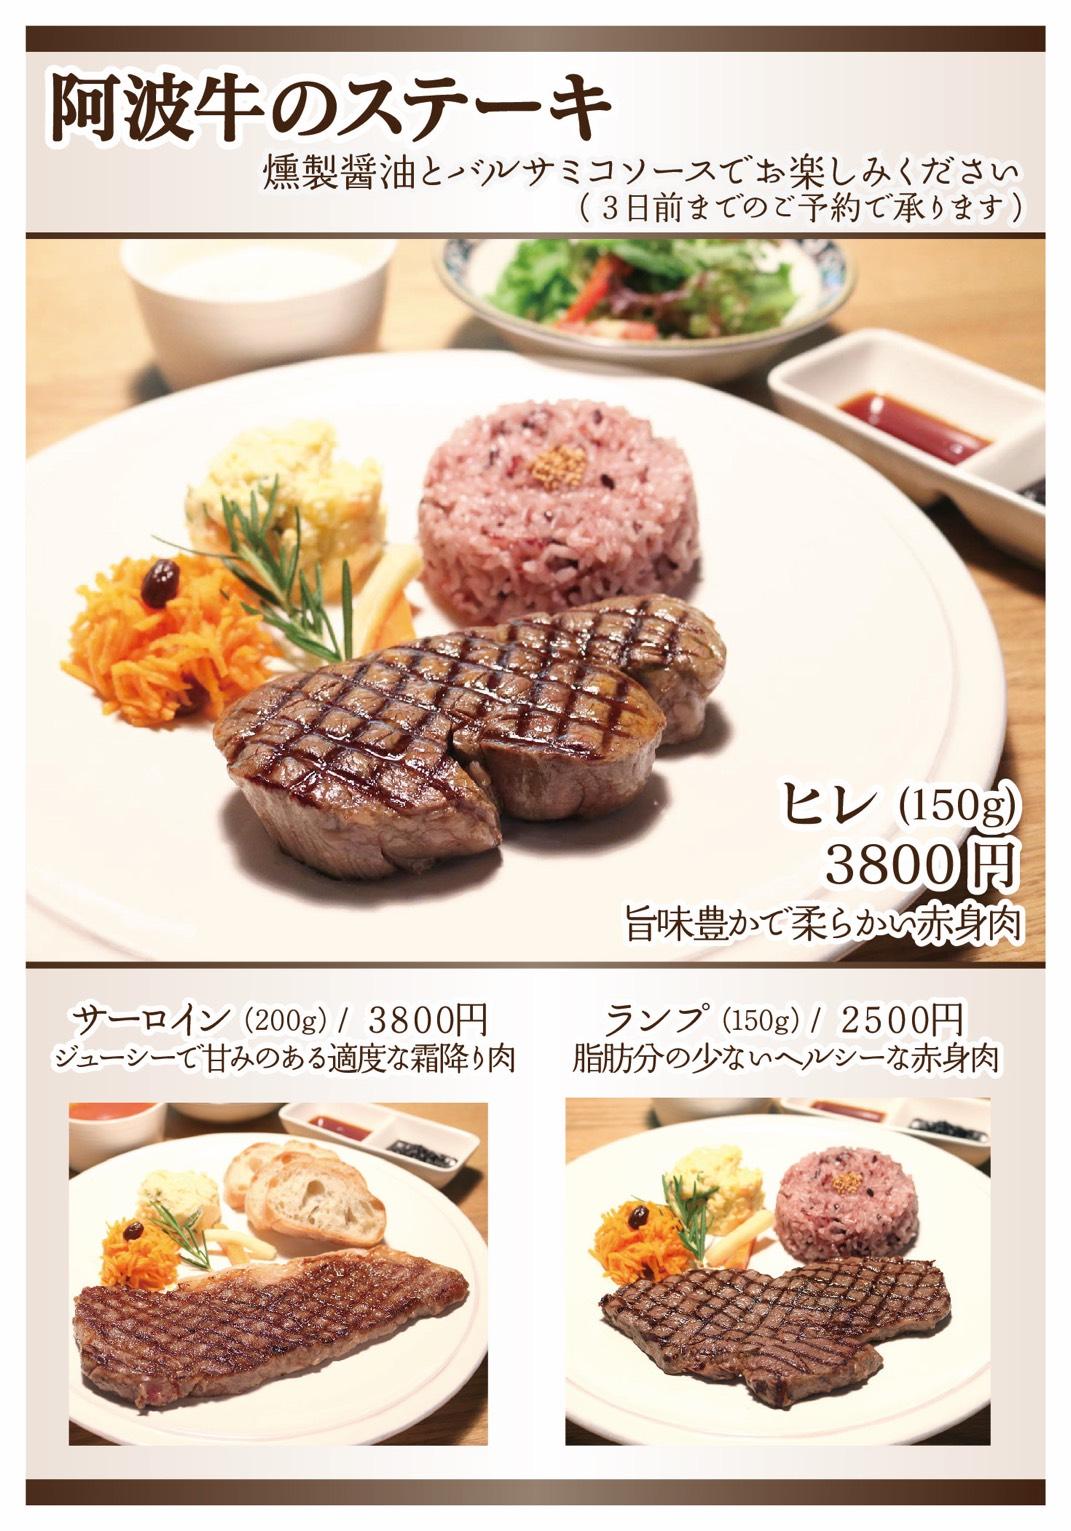 stake menu